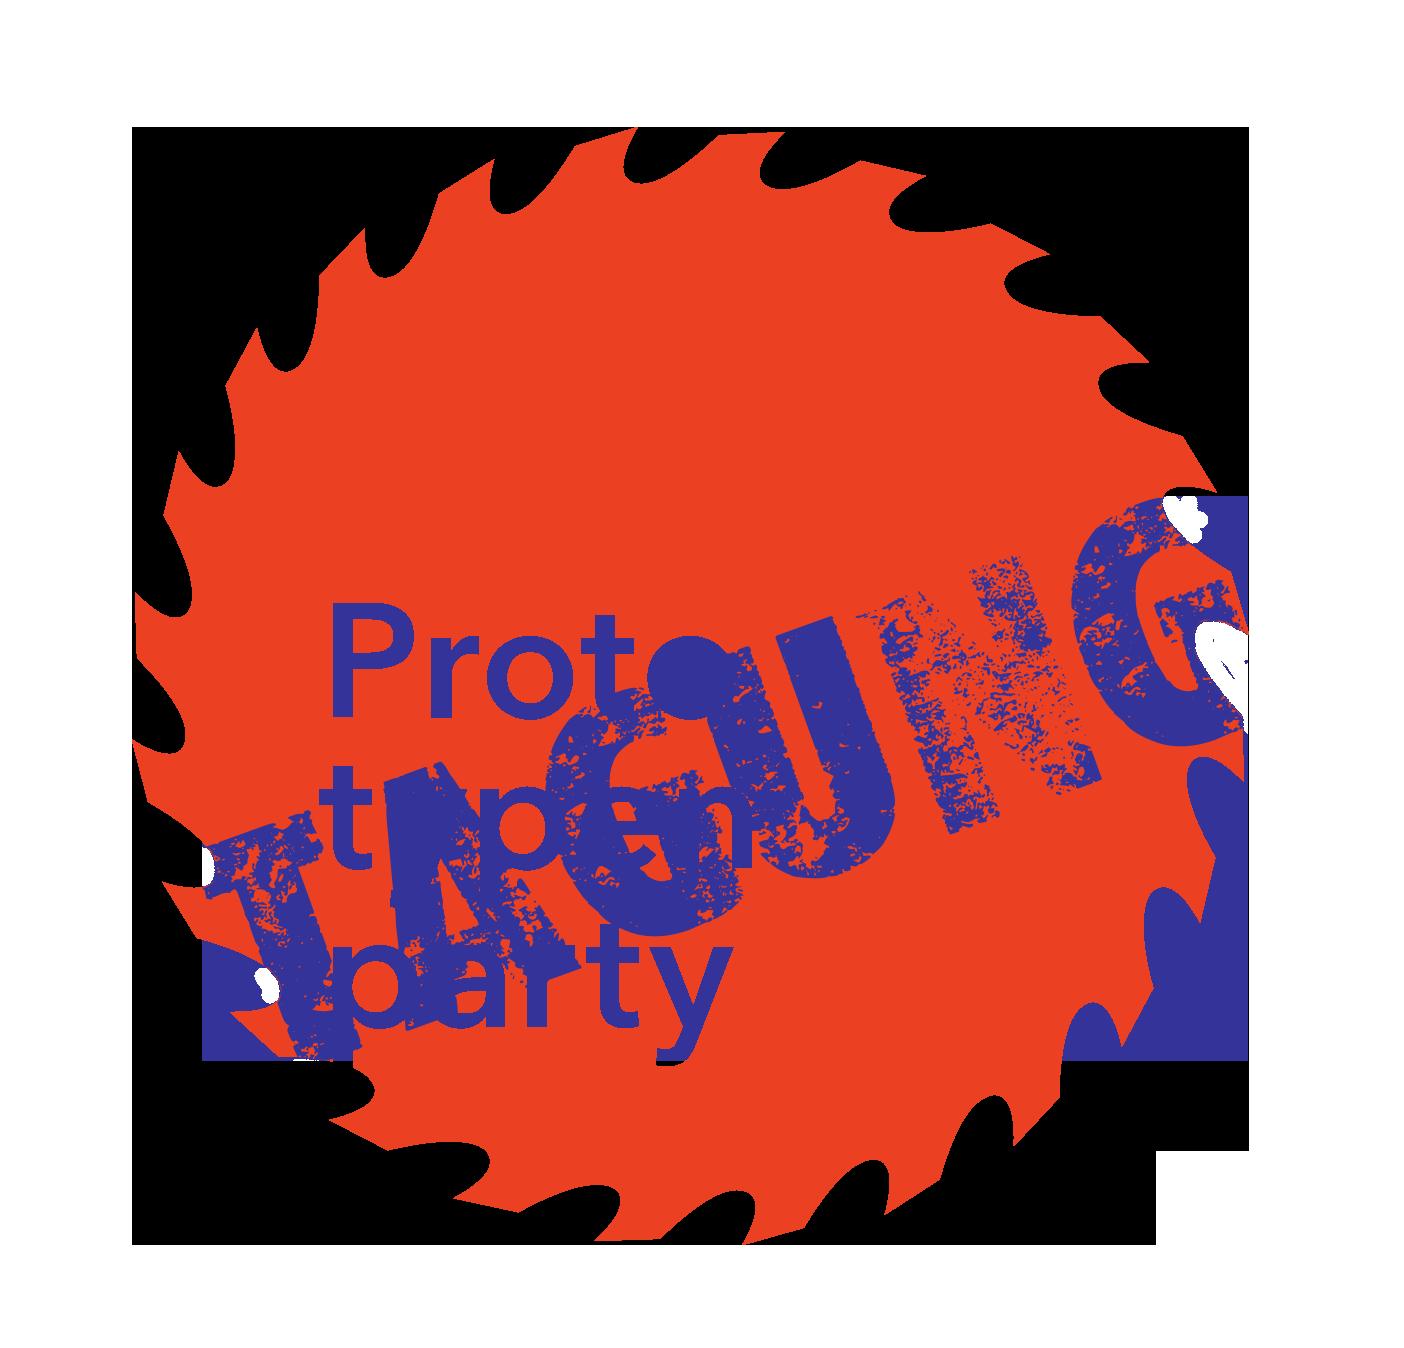 Logo der Prototypenparty